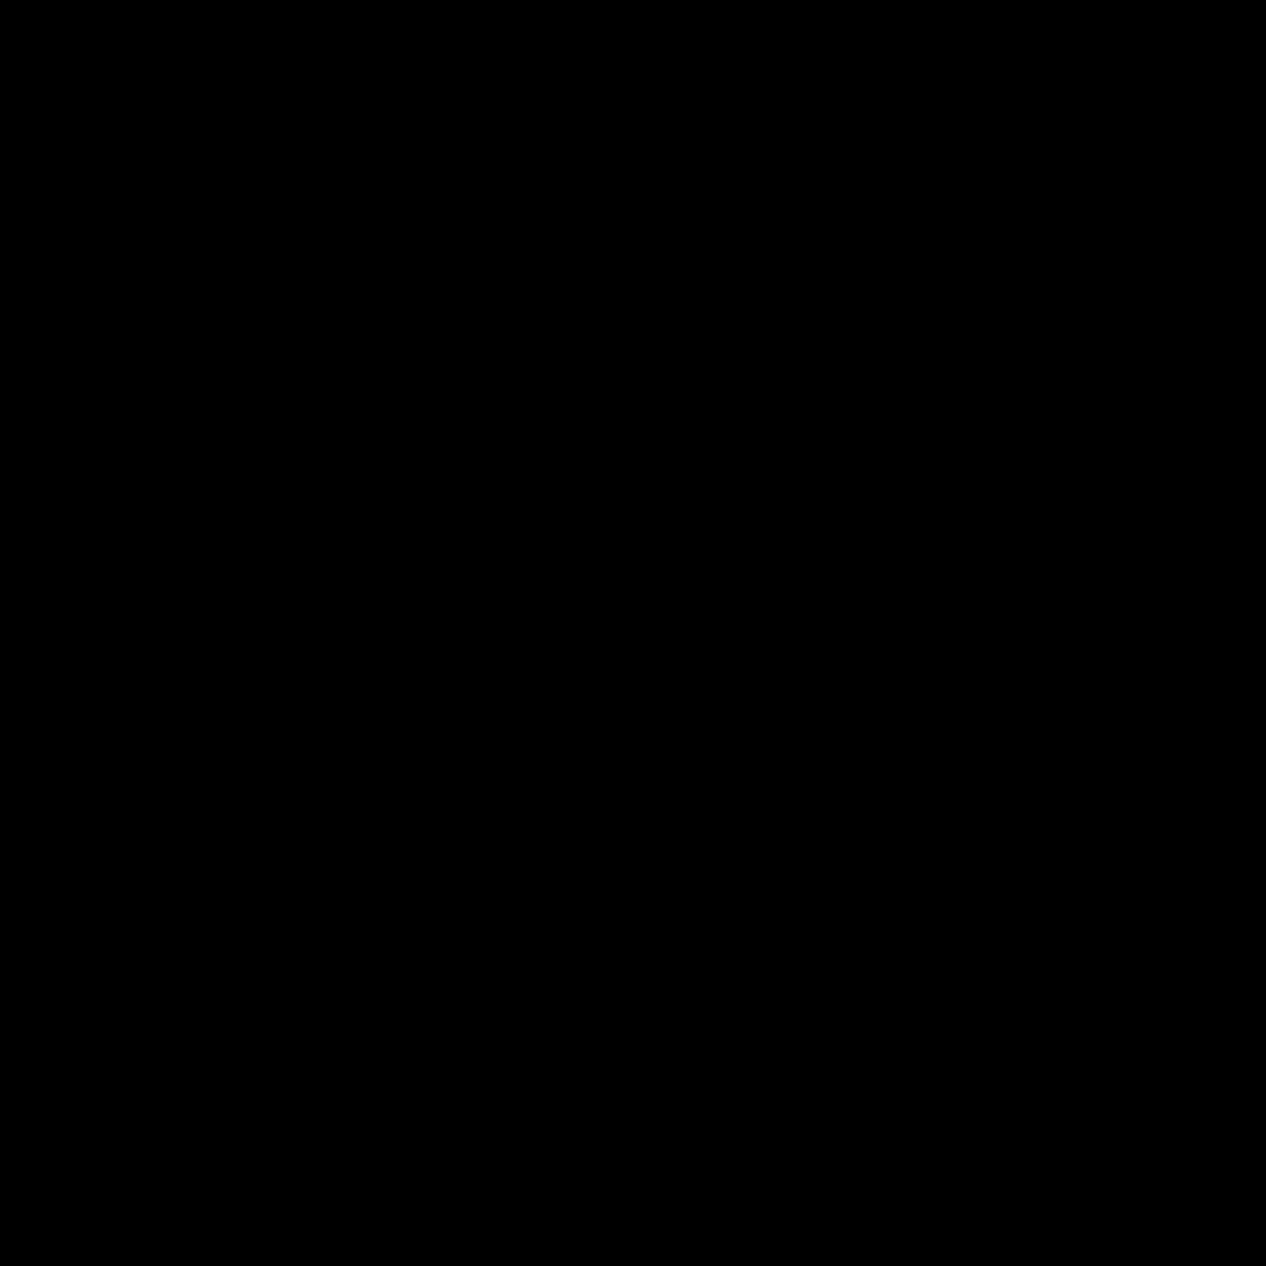 Male Vector Silhouette Icon Circle.